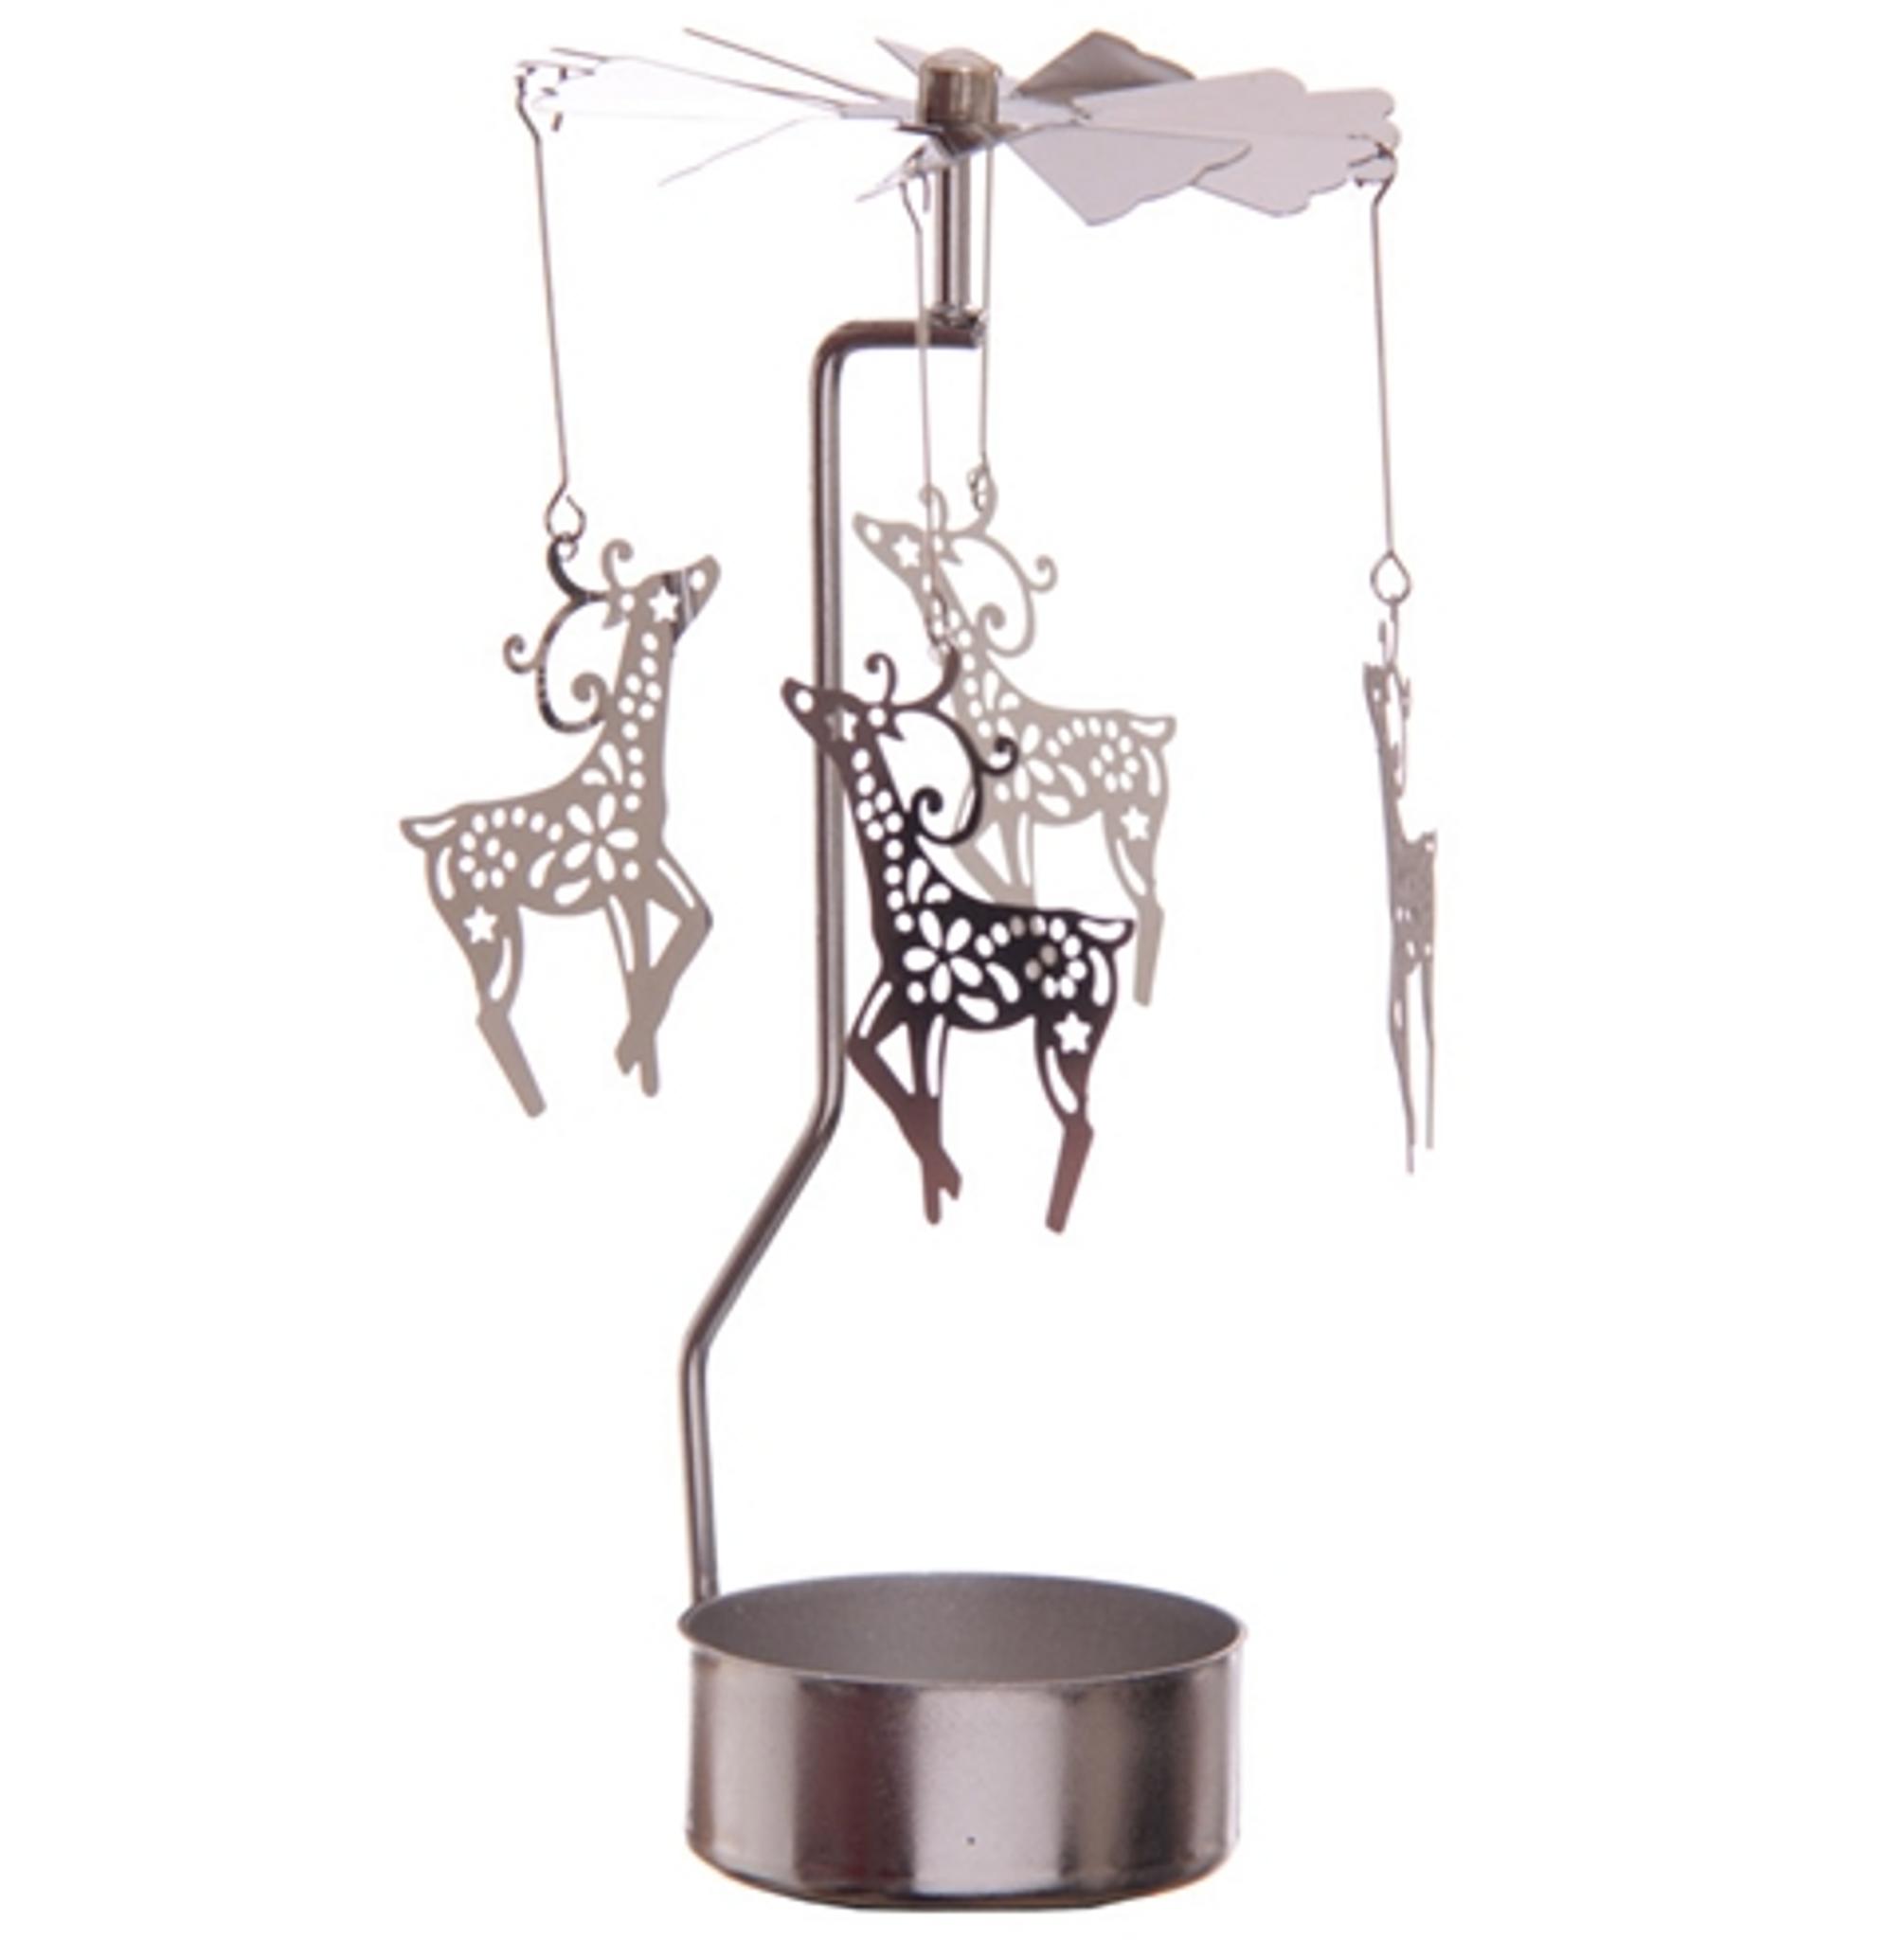 Reindeer Carousel Tea Light Christmas Decorations Online